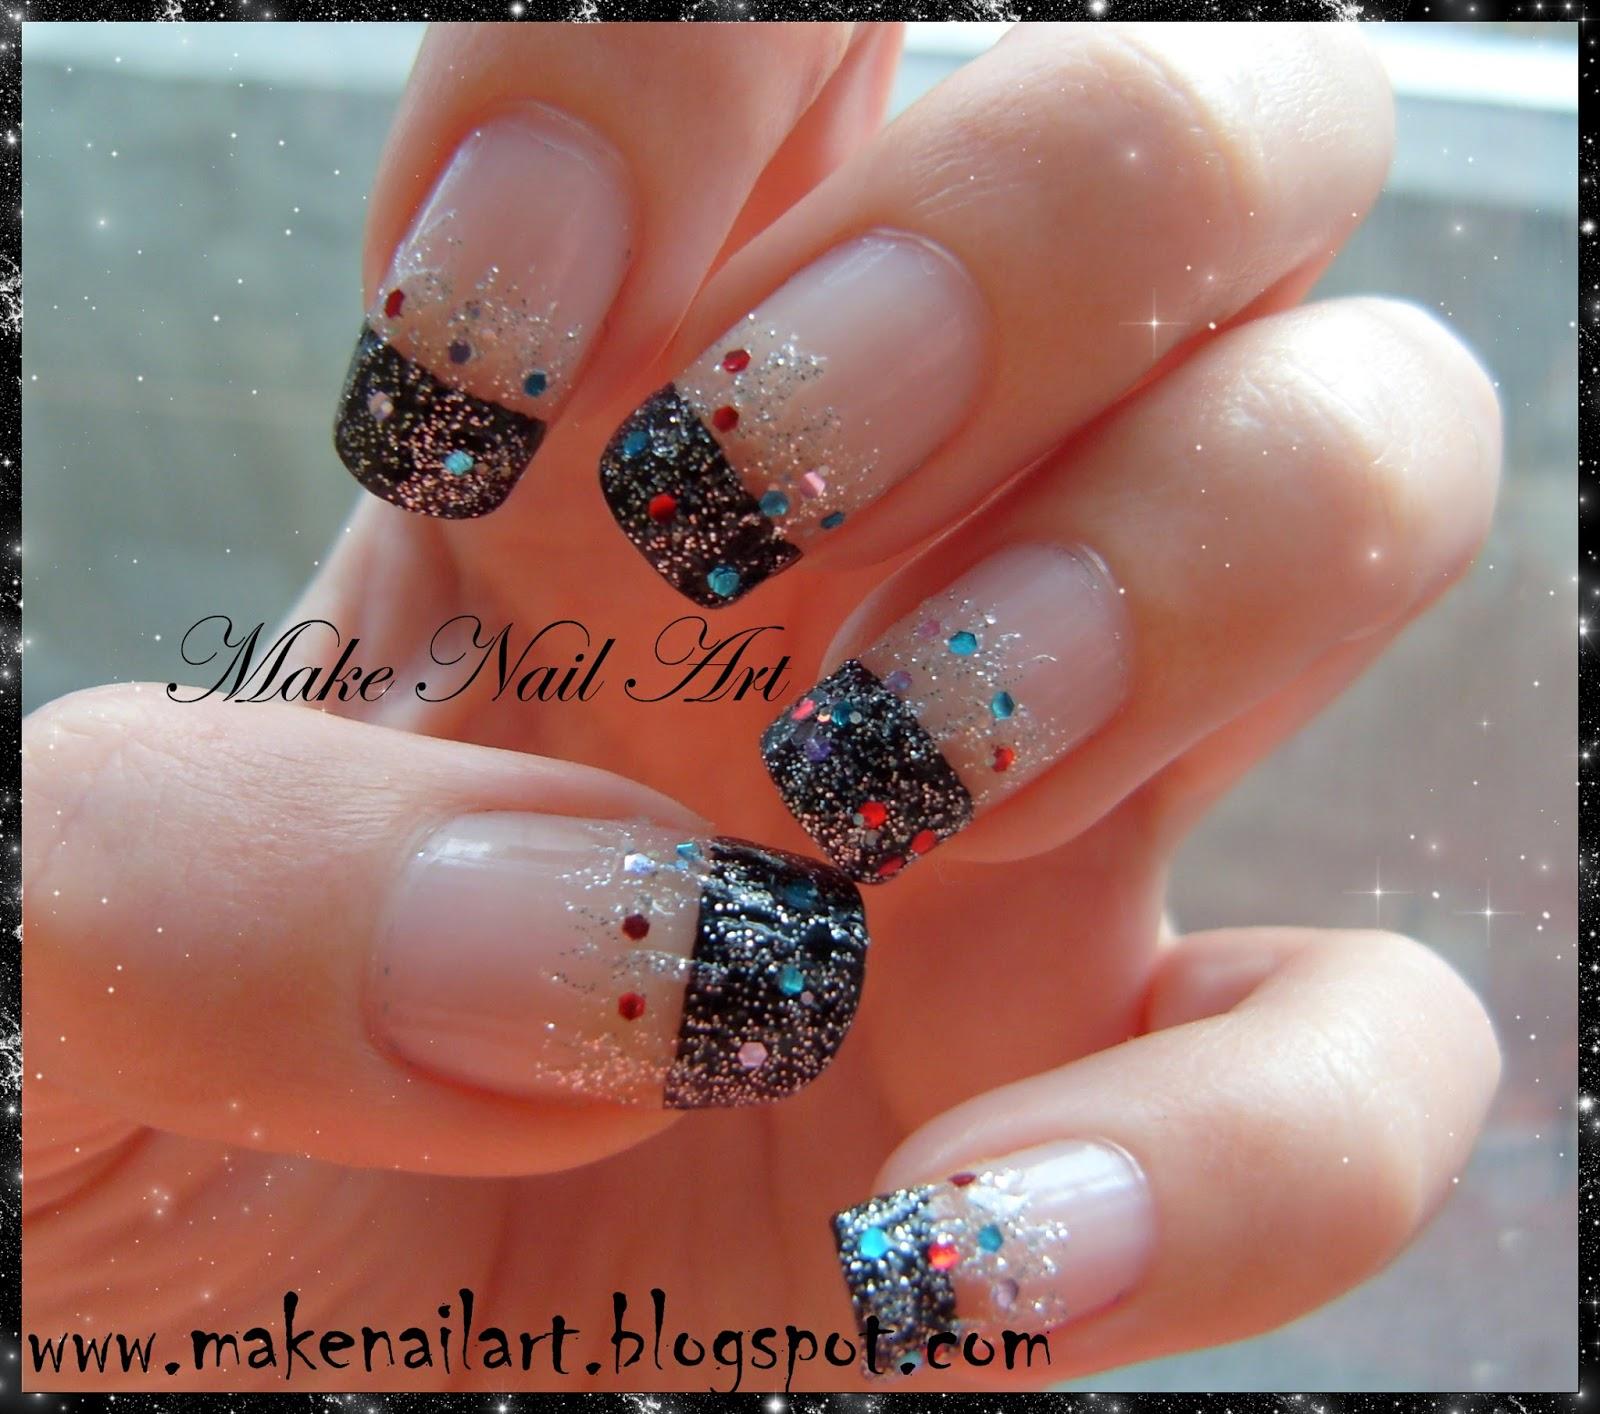 Make Nail Art: December 2013